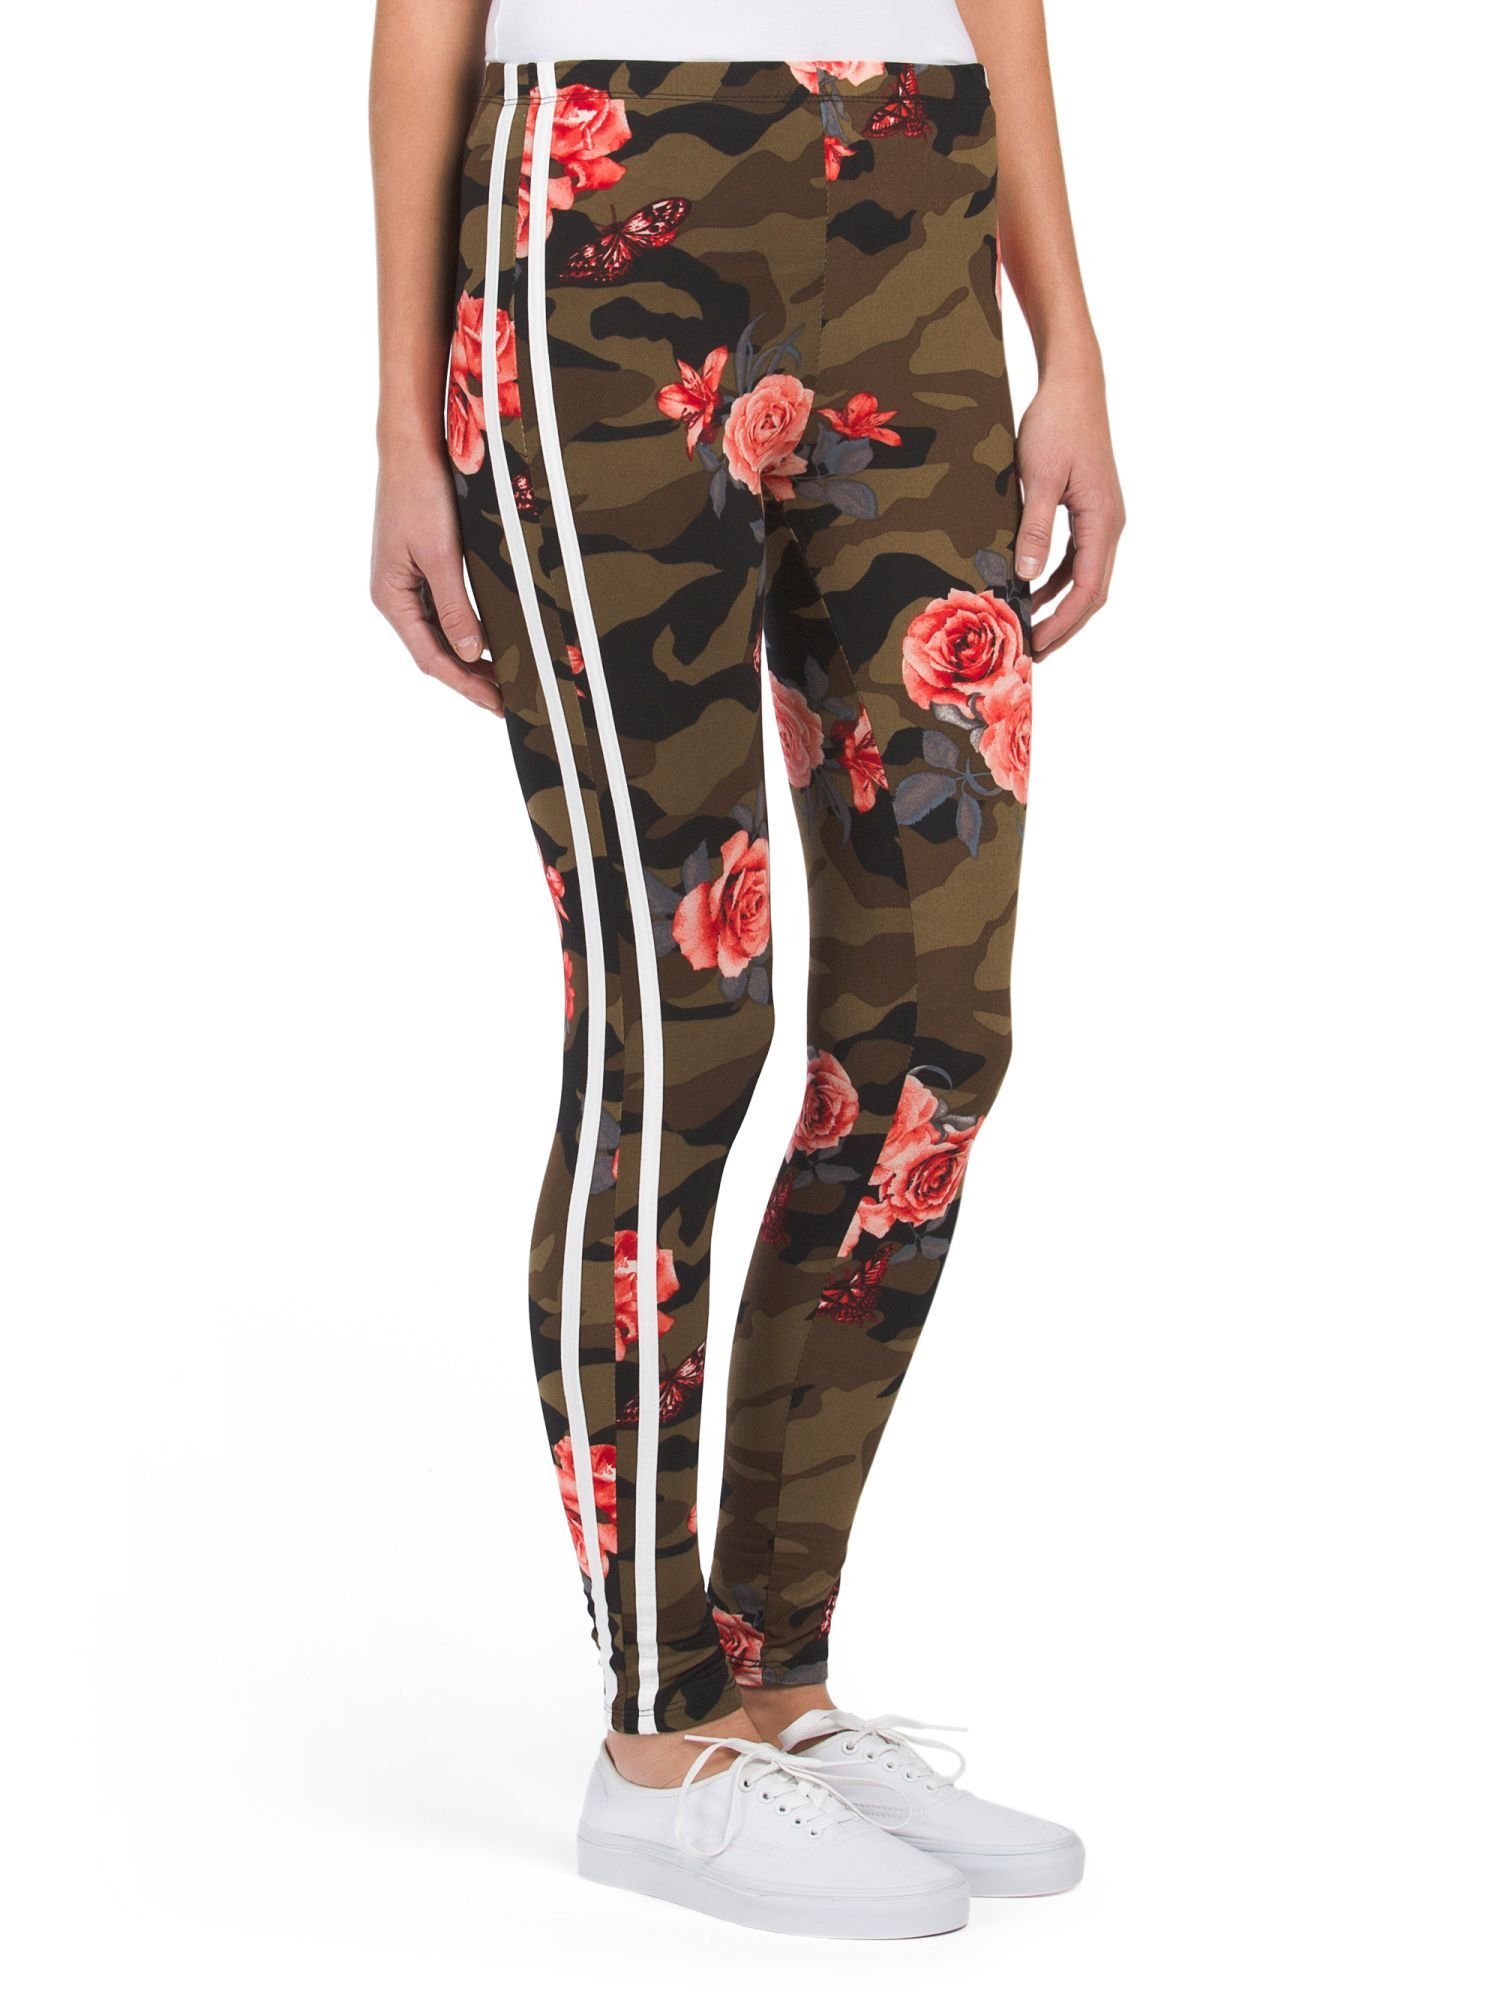 029485038a1381 TJ Maxx, $5, Large Camo rose leggings Jeans Pants, Leggings Are Not Pants